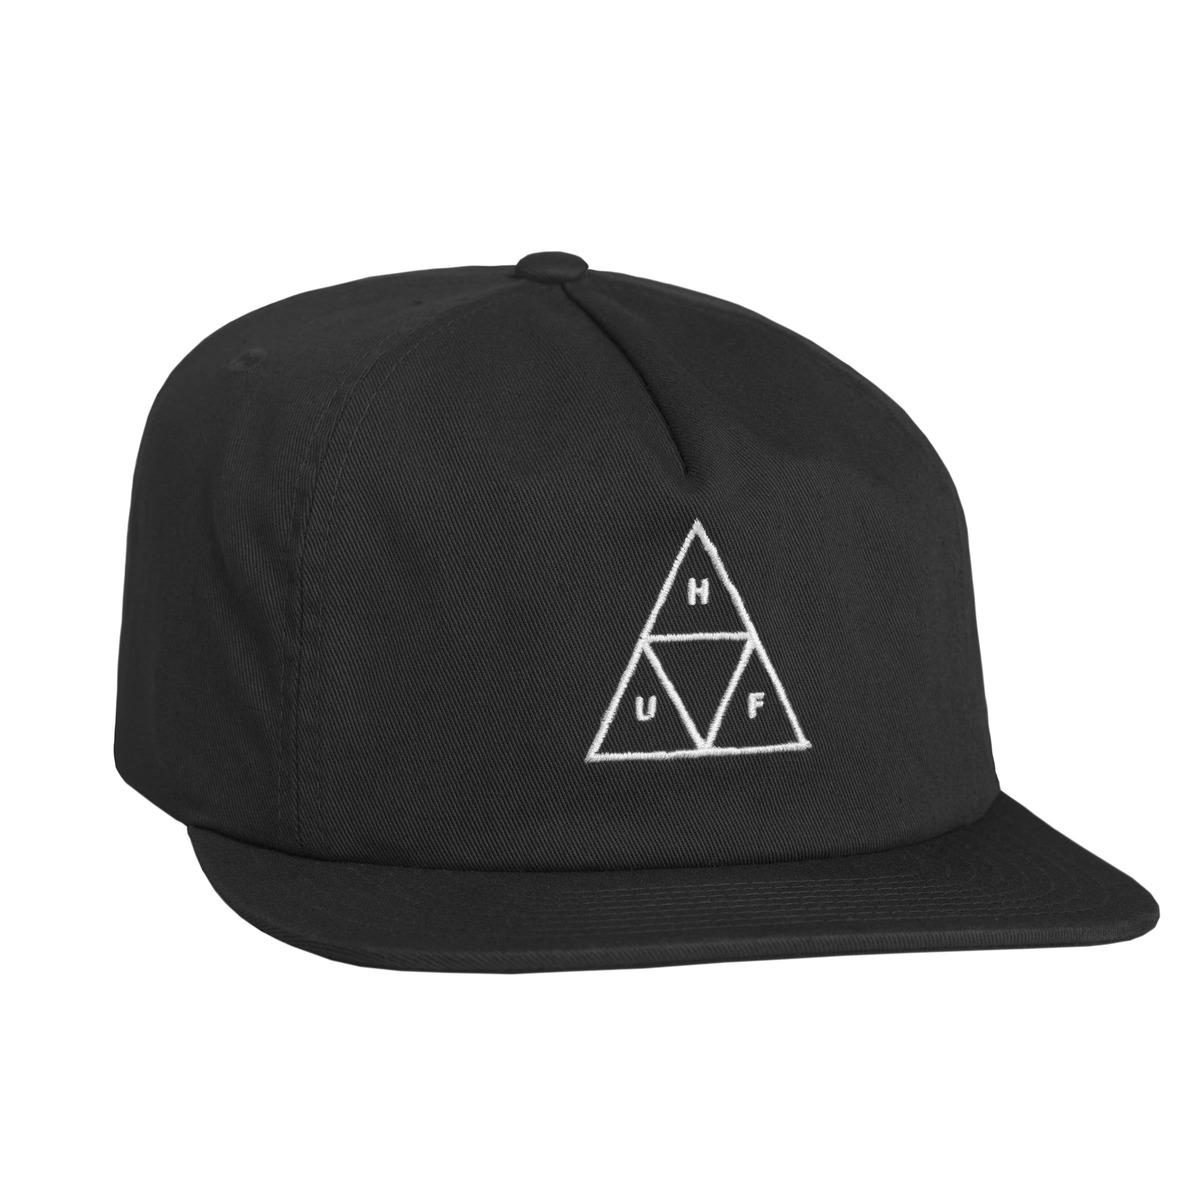 ... discount 50abe 52b79 Huf Wash Triple Triangle Snapback Hat - Black ... ee9902d21e85